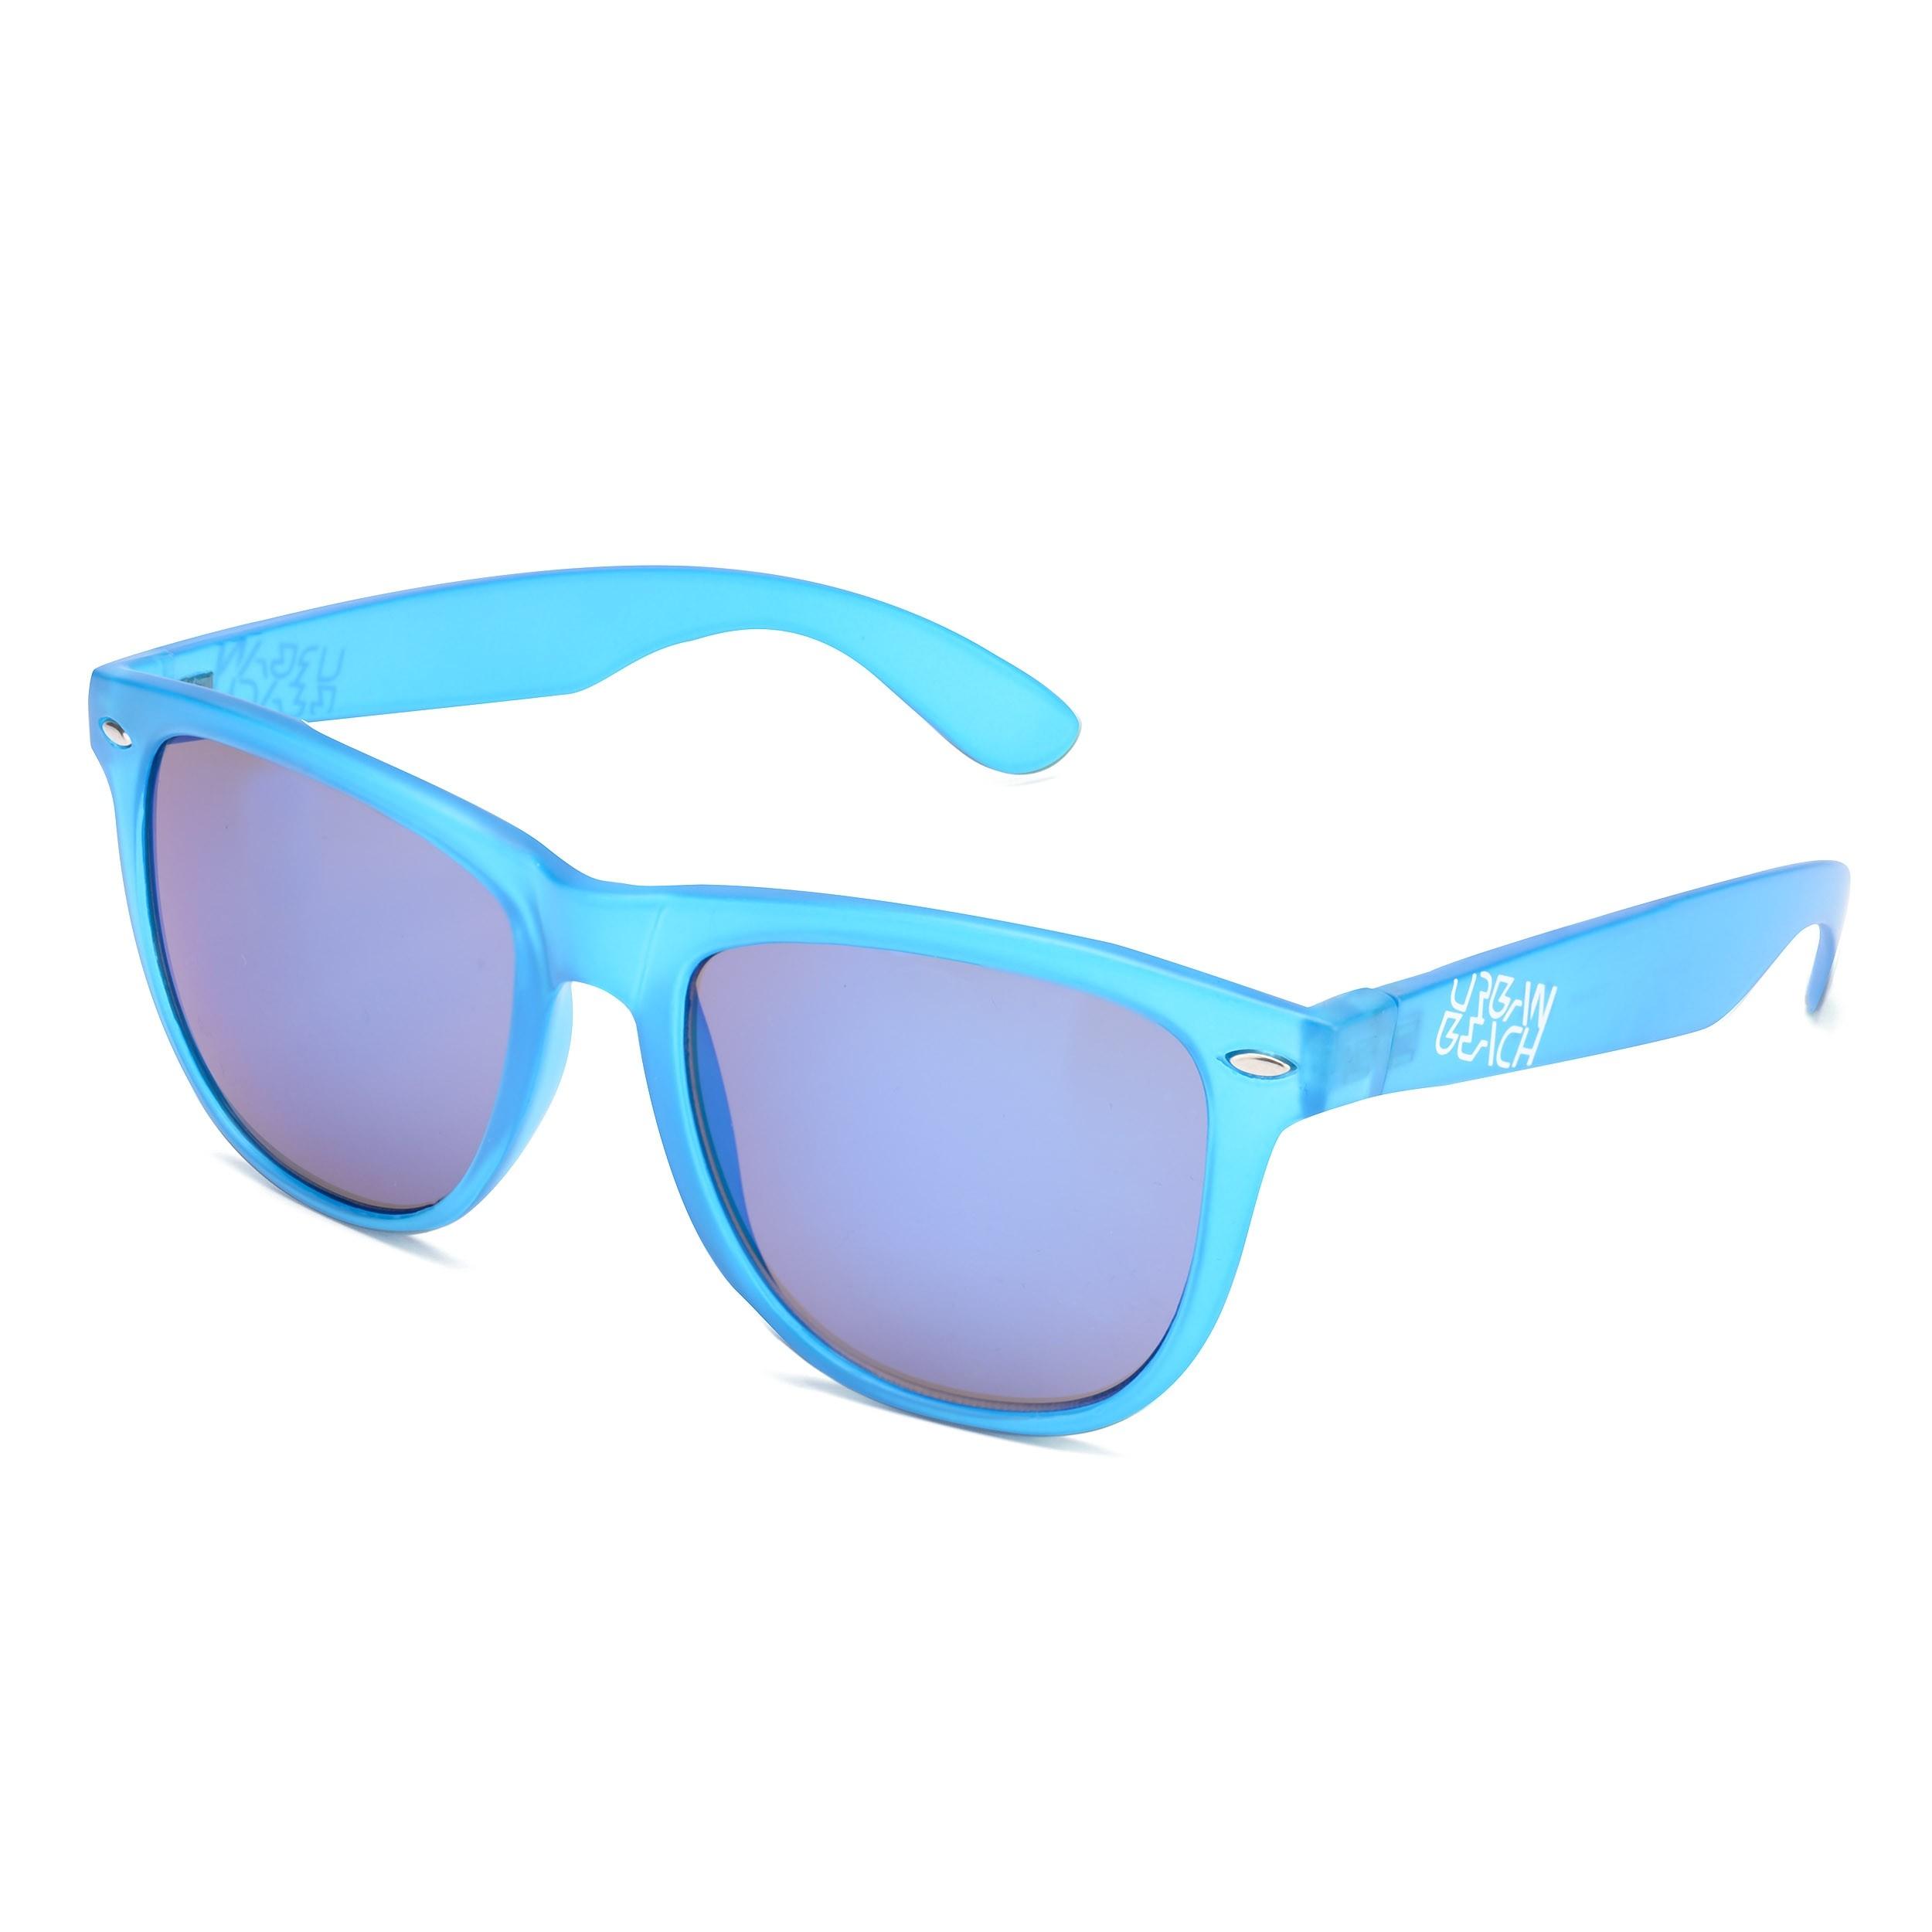 Unisex Blue Tron Sunglasses